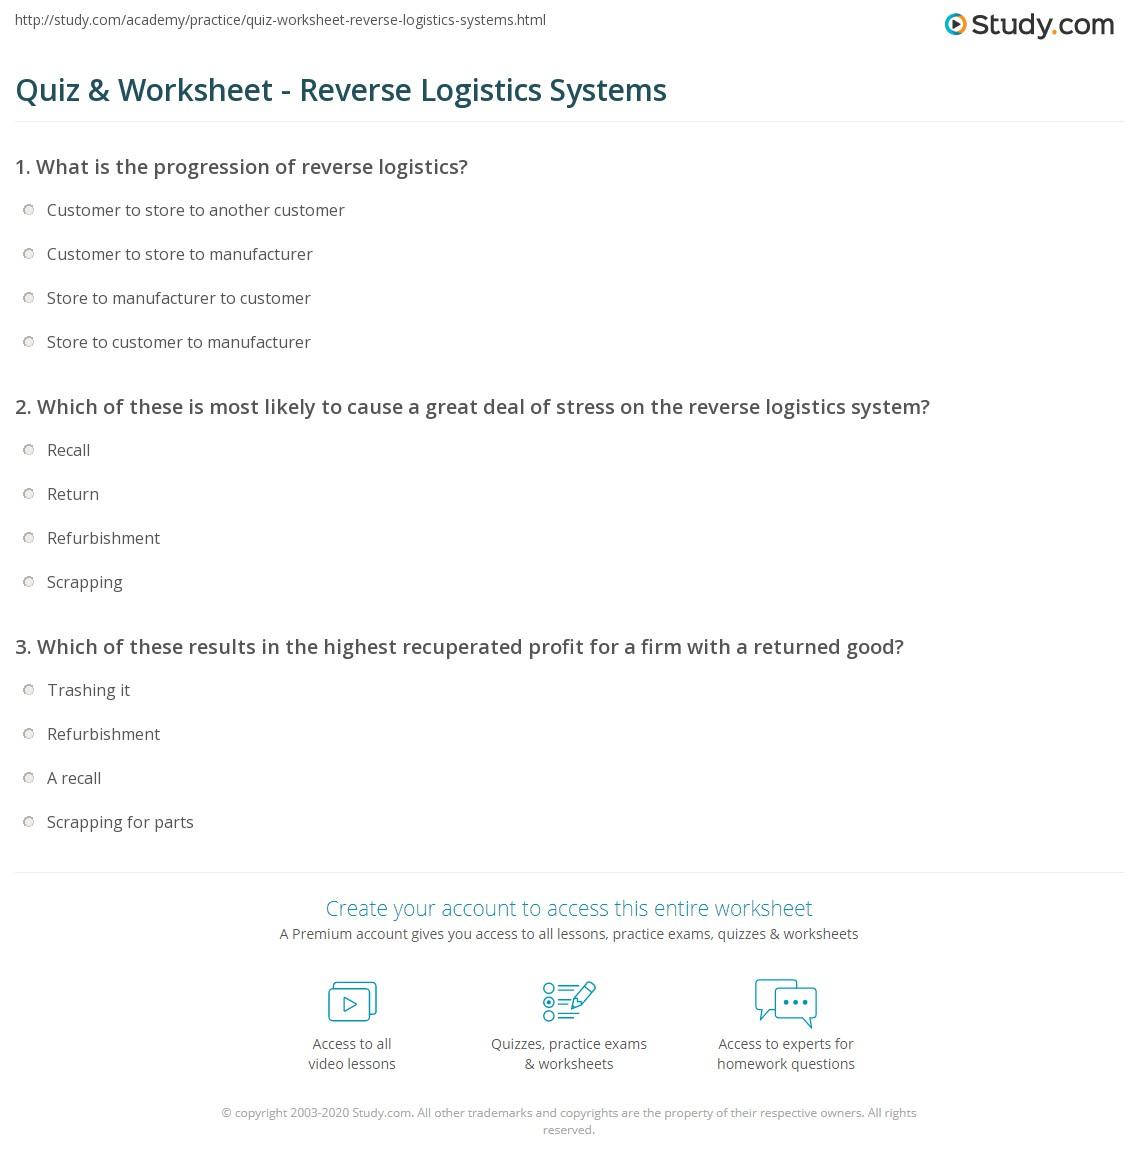 Quiz Worksheet Reverse Logistics Systems Study